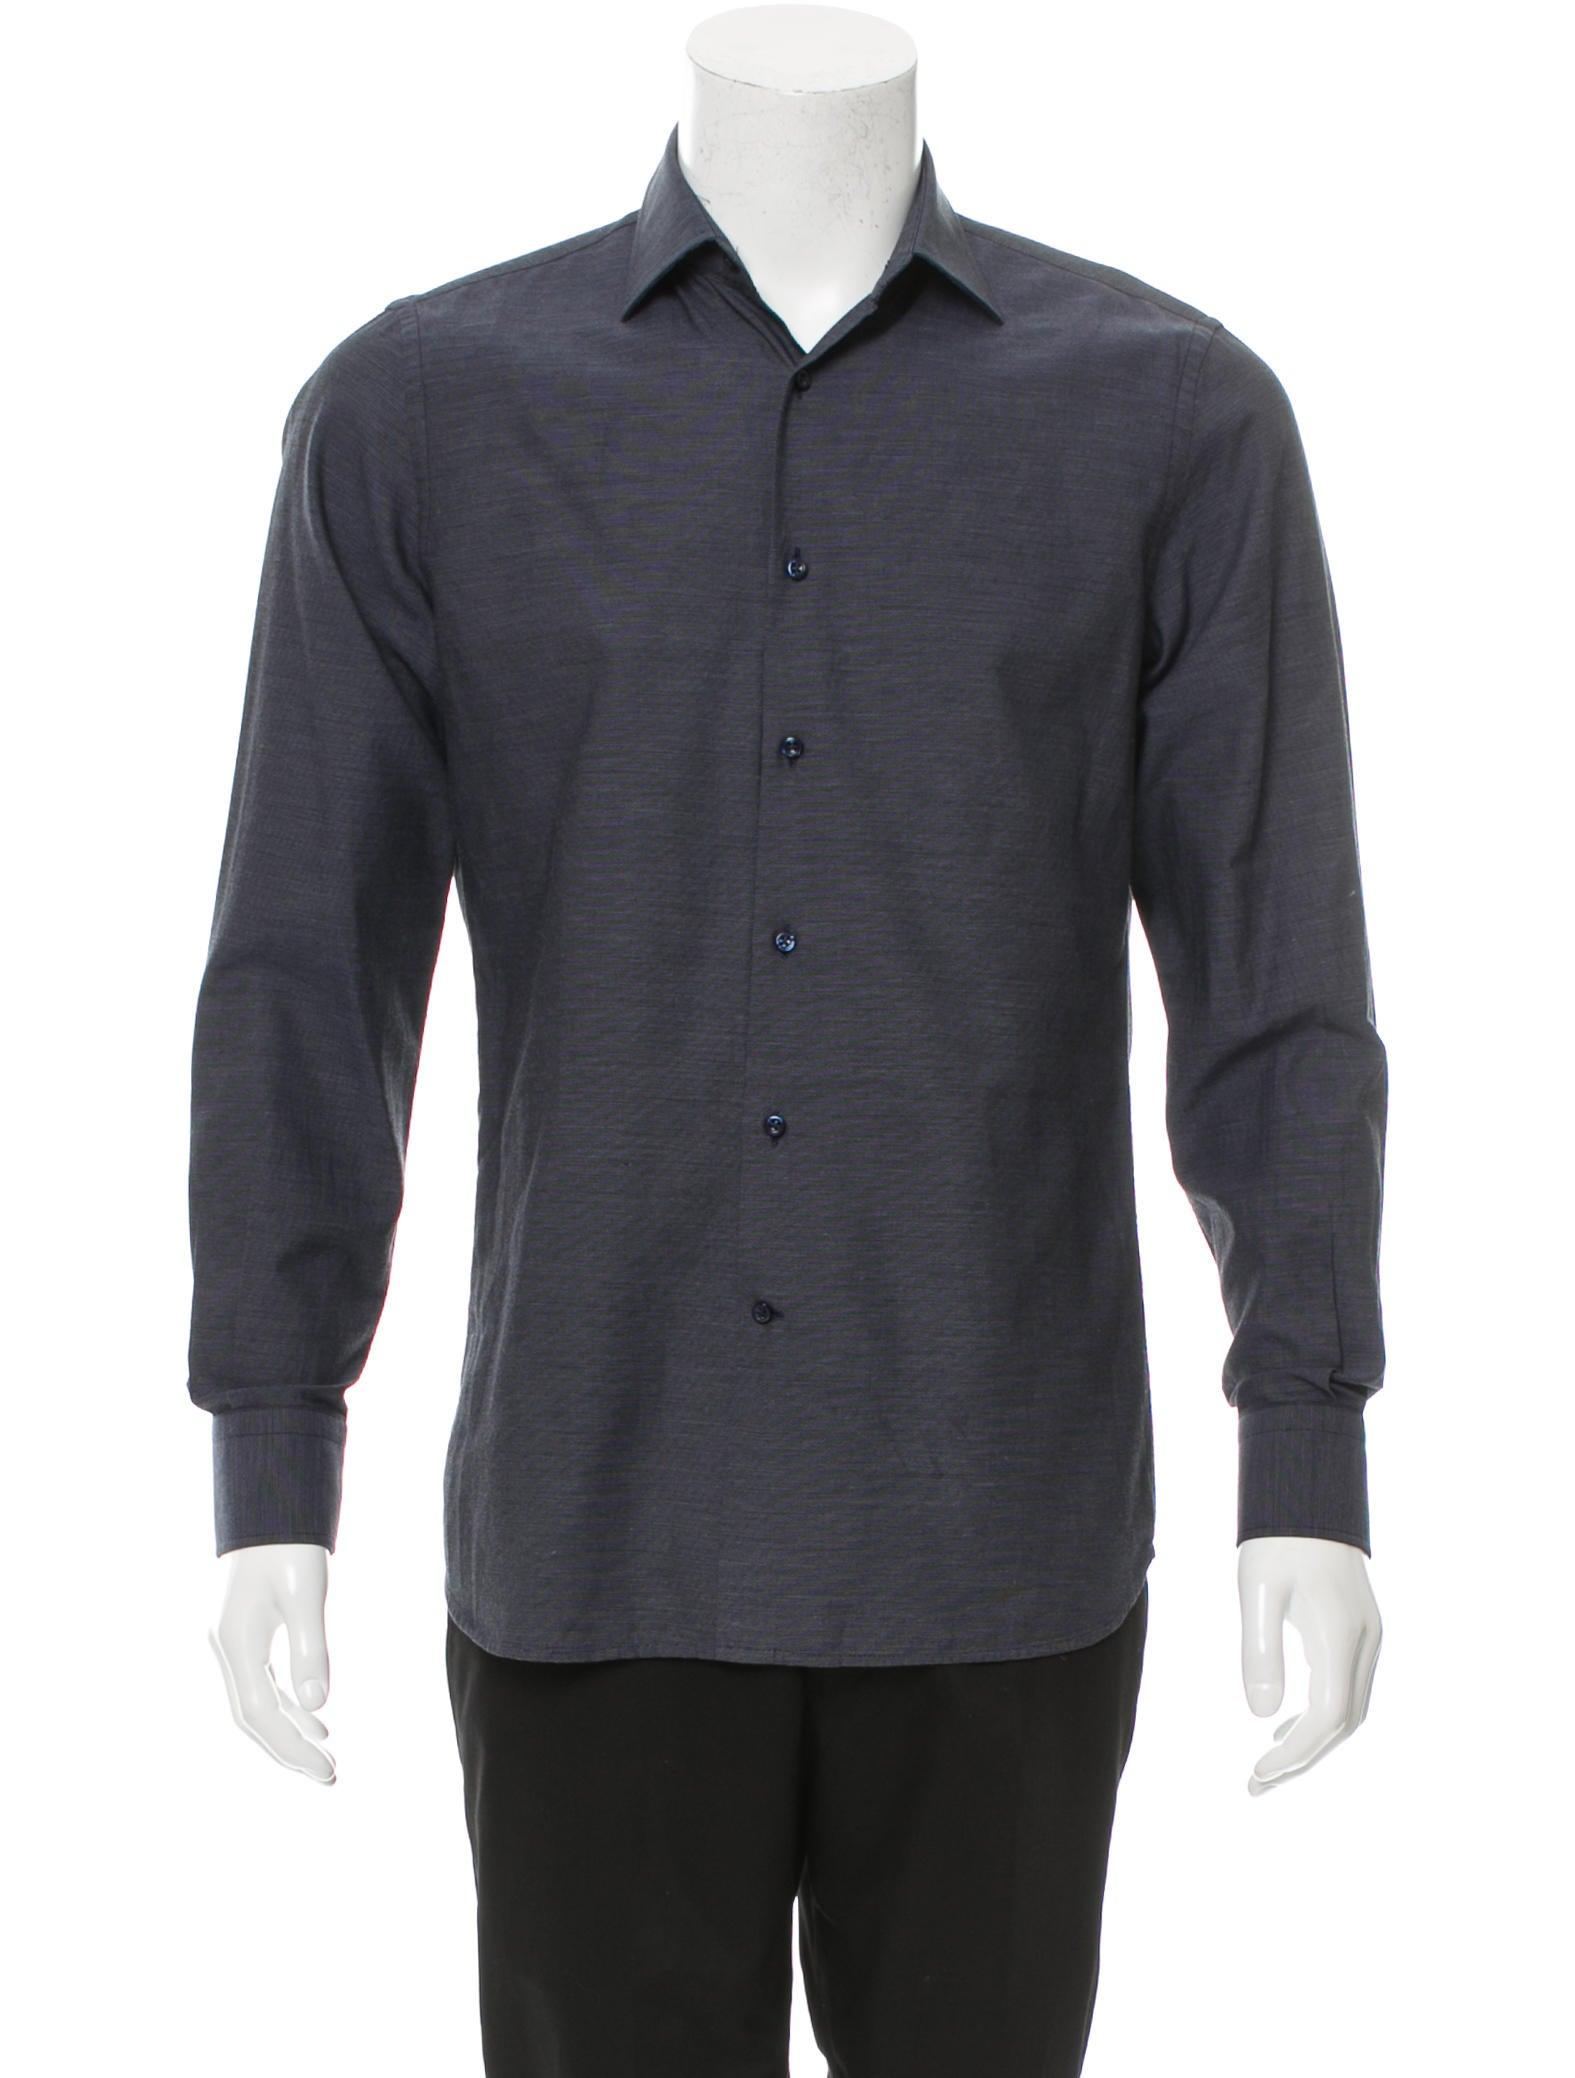 J Lindeberg Long Sleeve Button Up Shirt Clothing